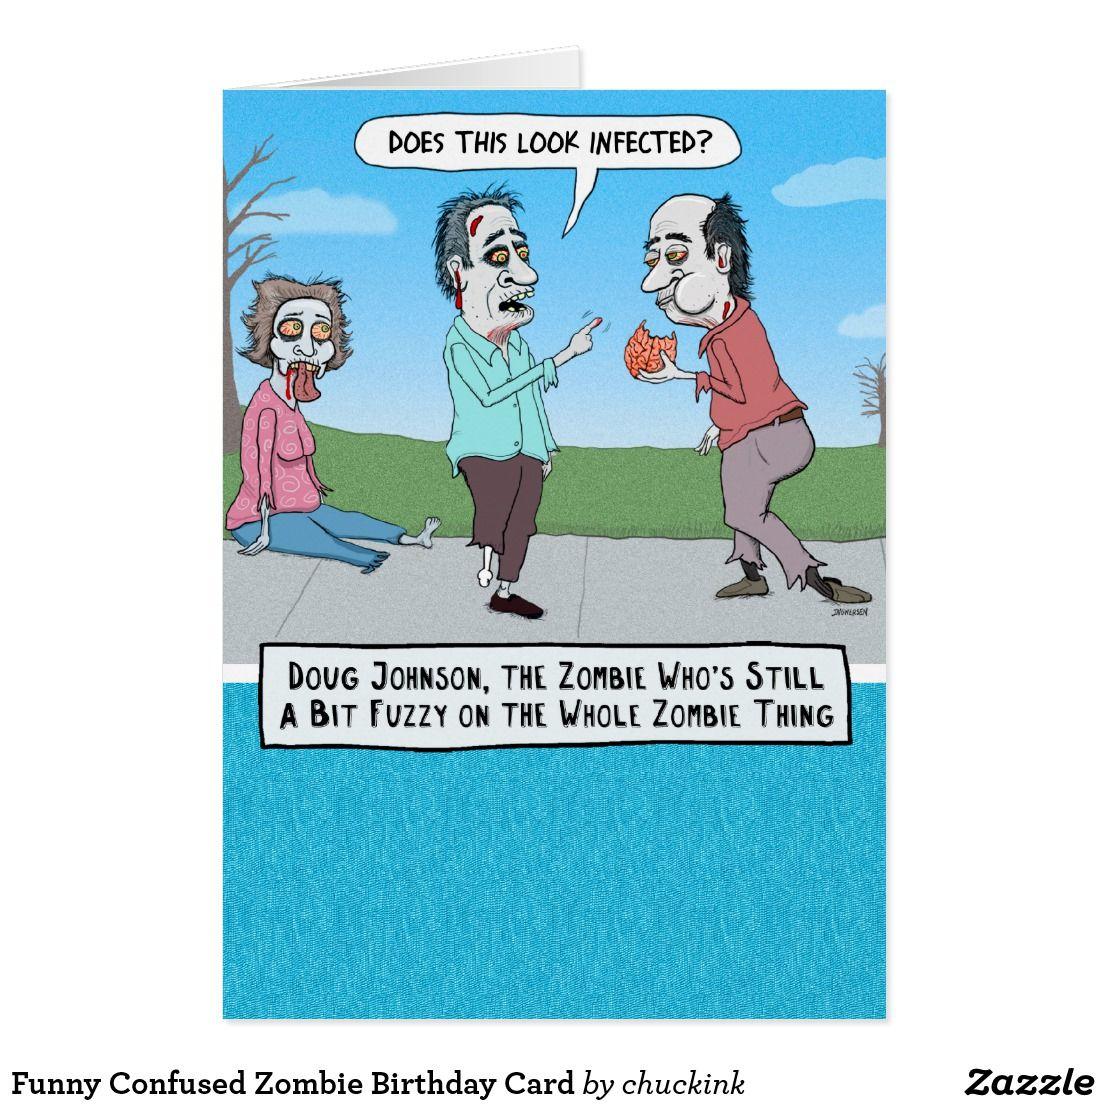 Funny confused zombie birthday card birthdays funny confused zombie birthday card kristyandbryce Choice Image